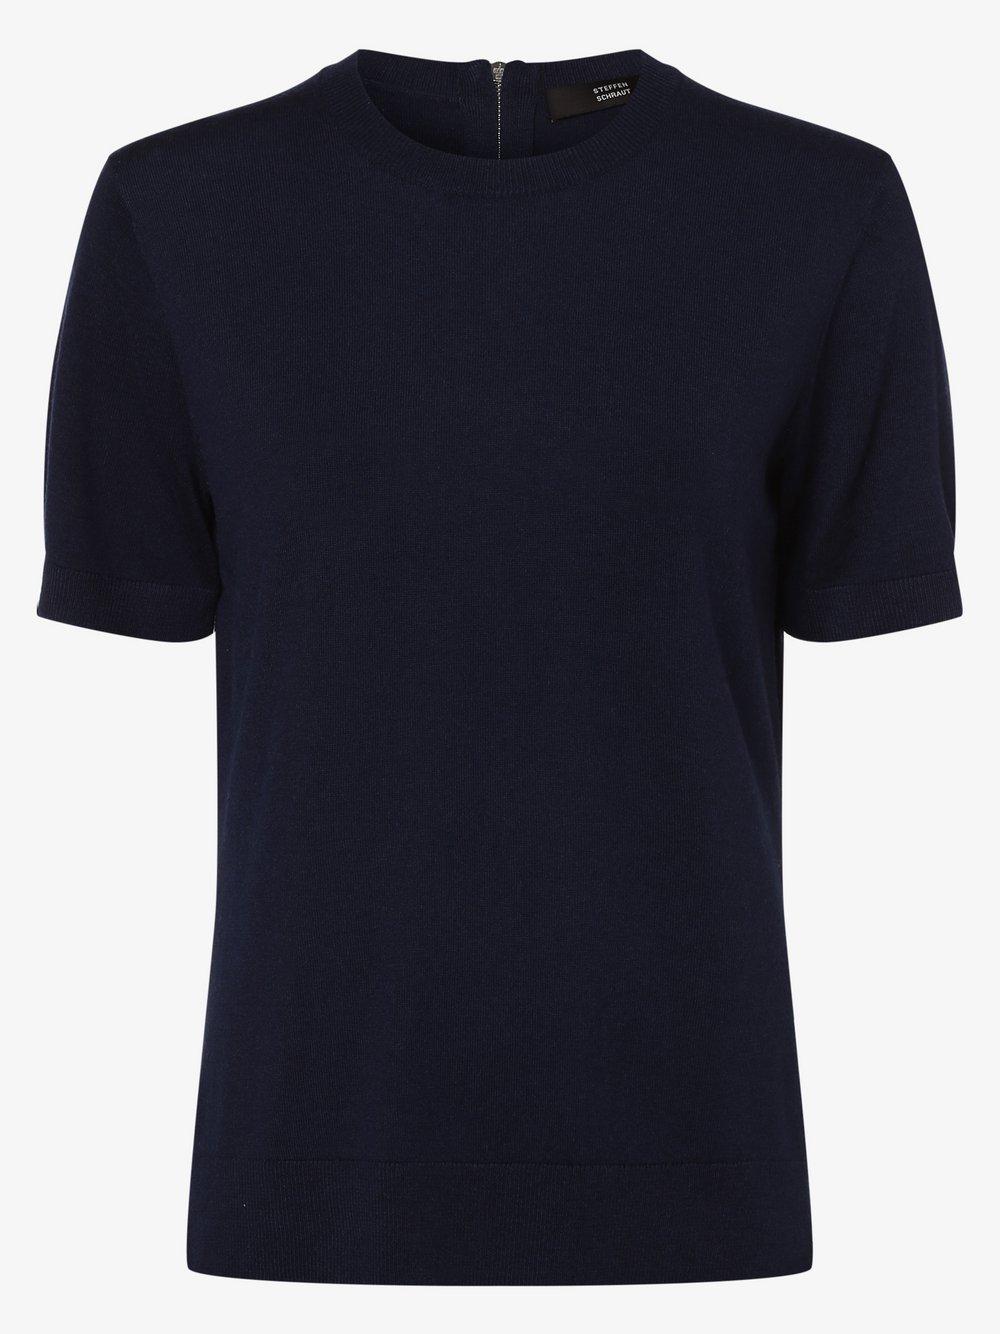 STEFFEN SCHRAUT – Sweter damski z dodatkiem kaszmiru, niebieski Van Graaf 462150-0001-00360